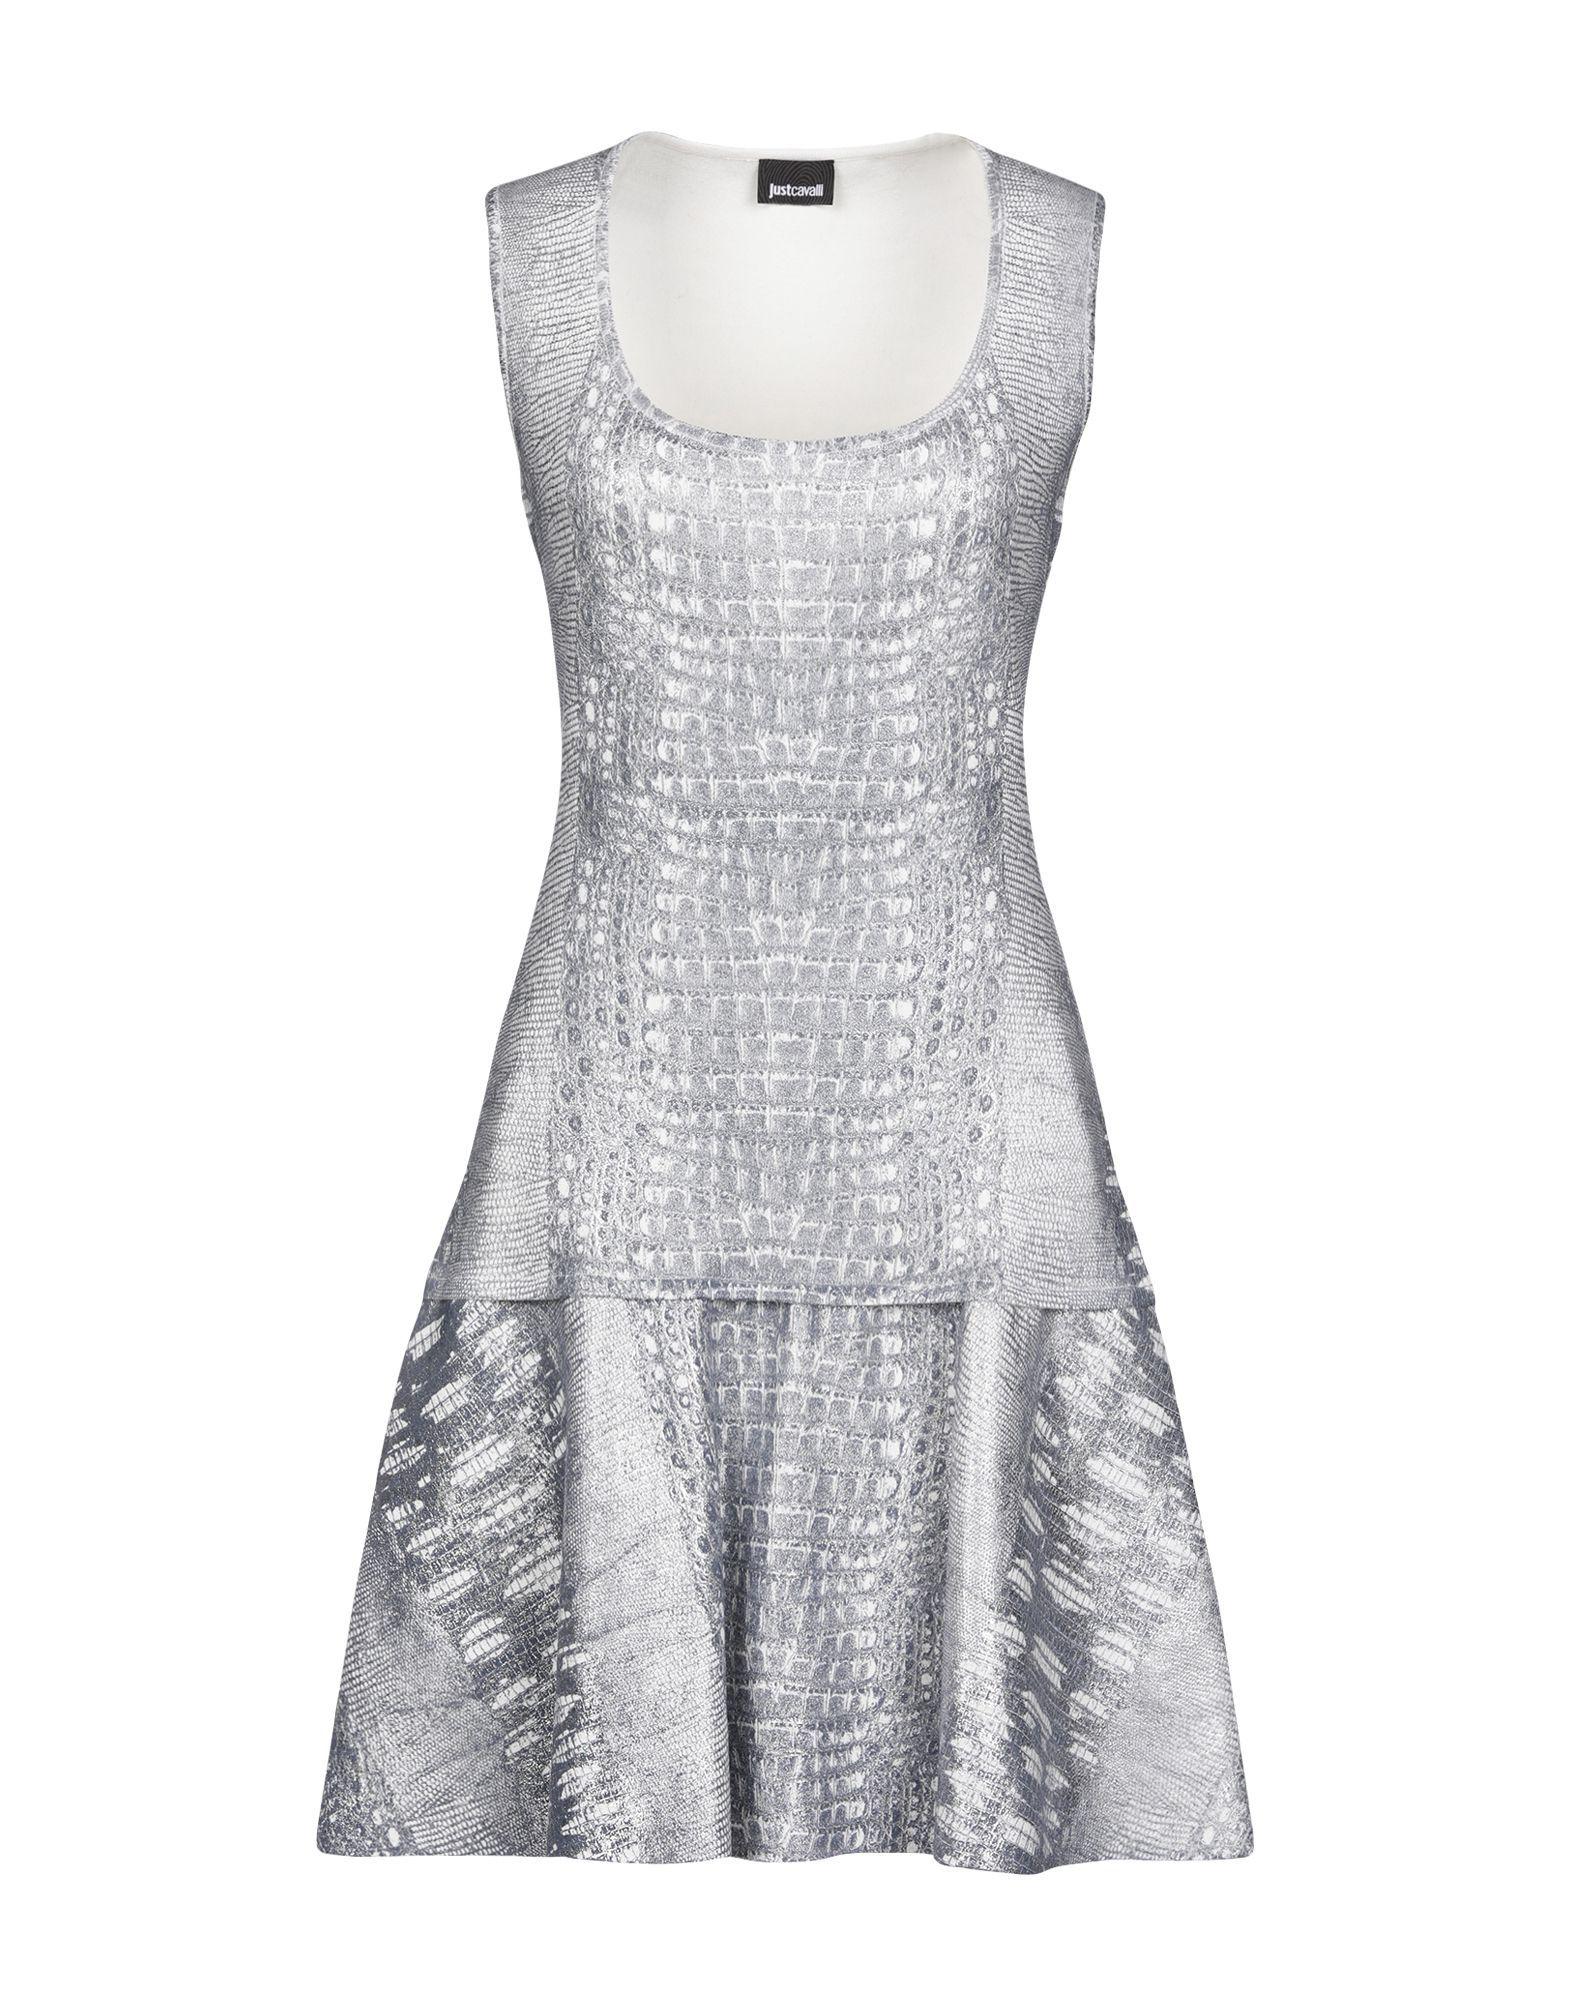 Just Cavalli Light Grey Short Dress